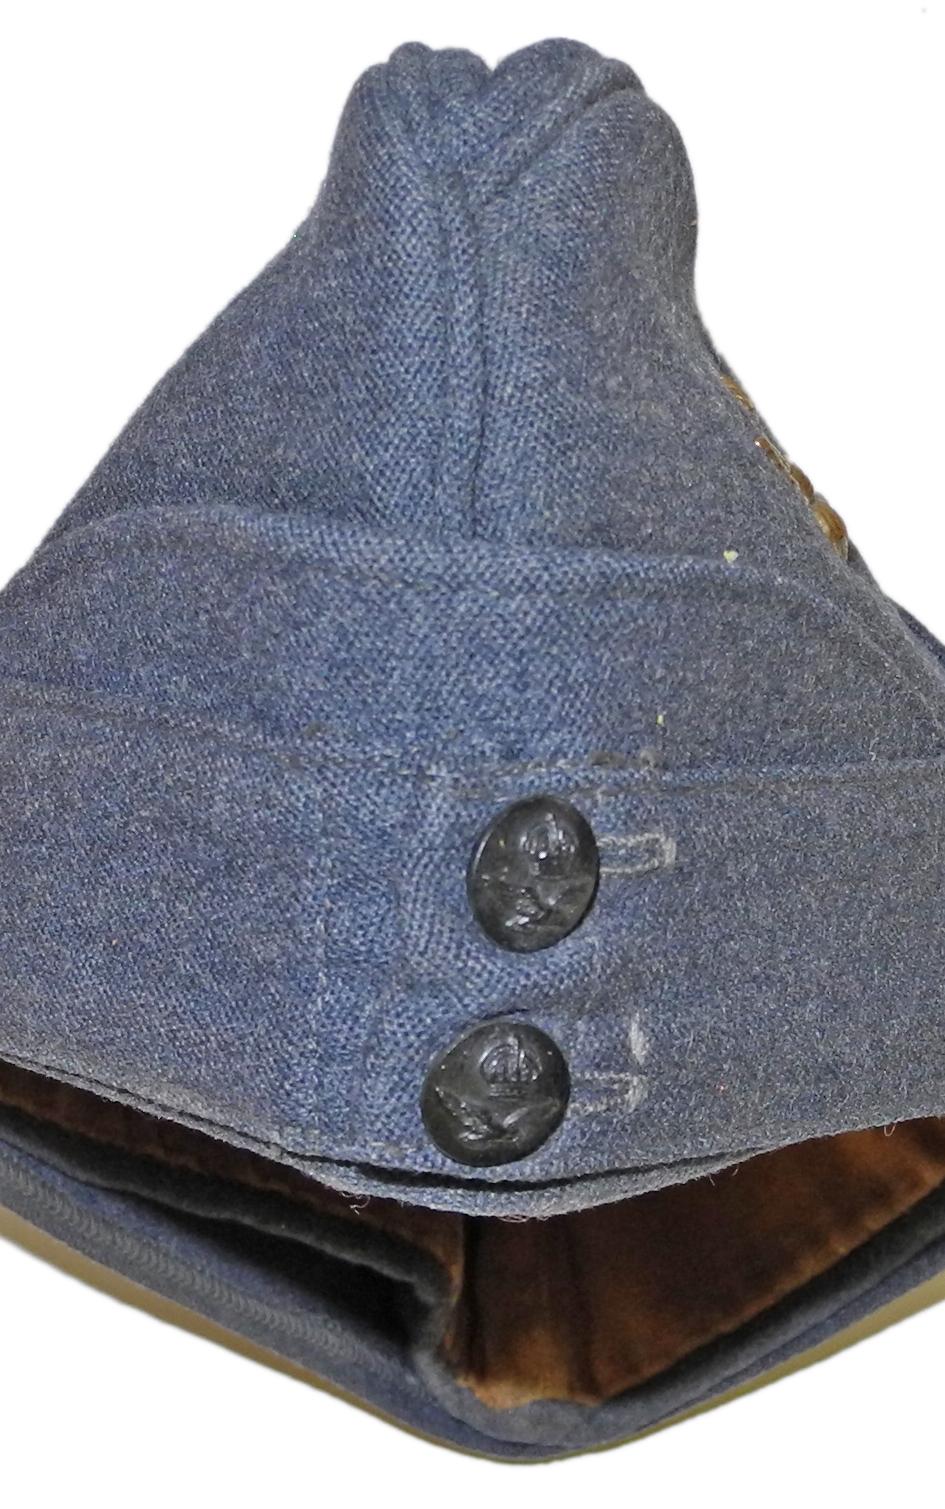 RAF officer's sidecap